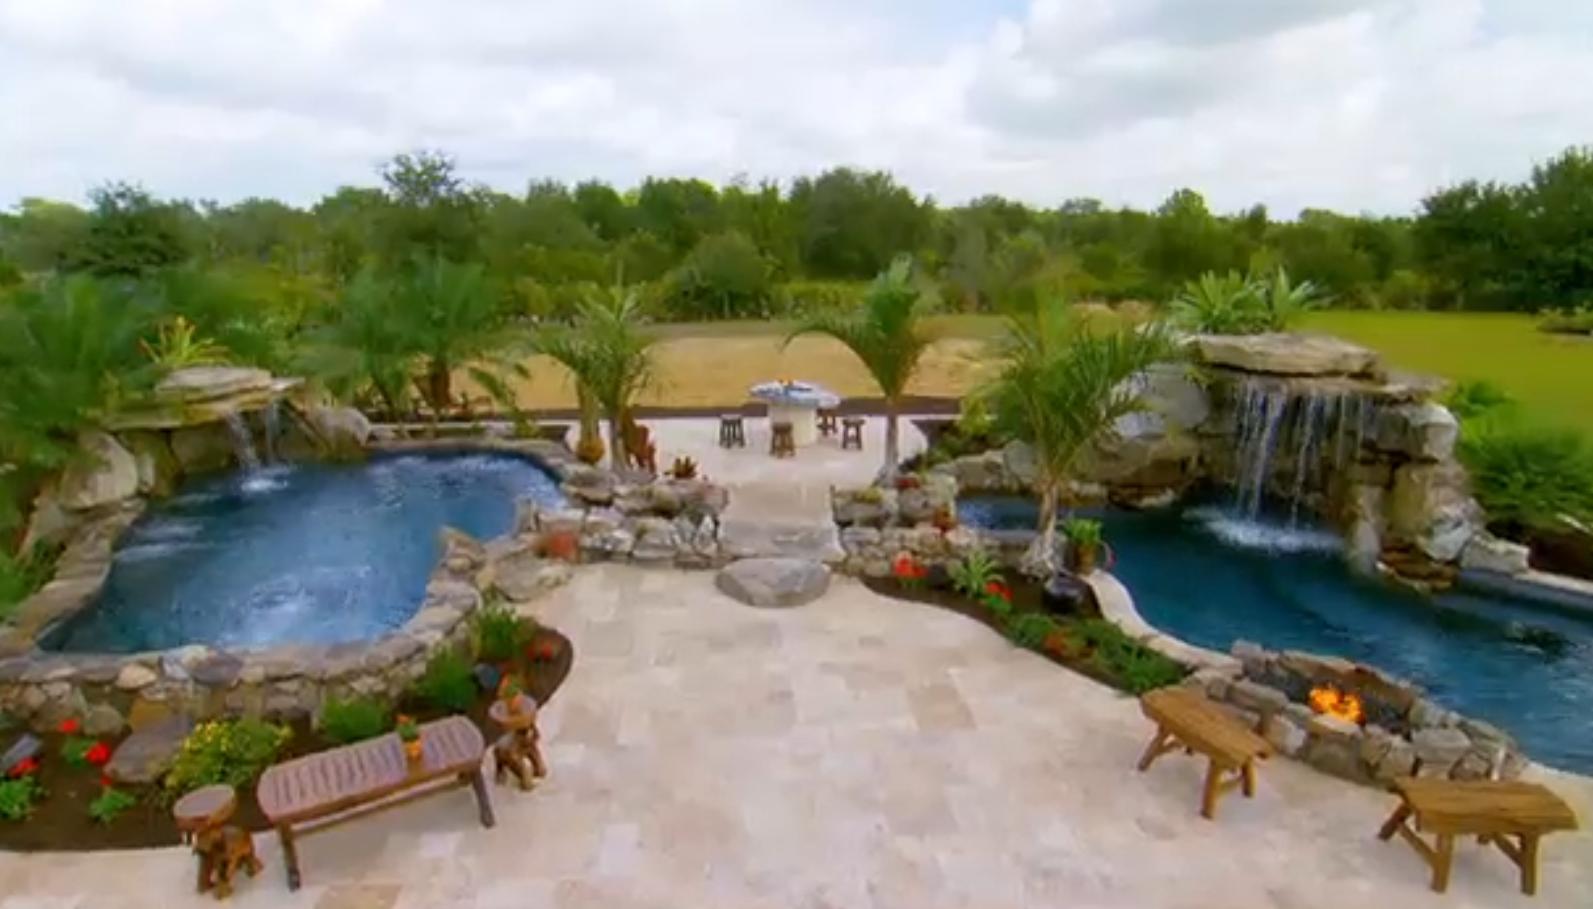 Insane Pools Off The Deep End Insane Pools Luxury Pools Indoor Outdoor Pool